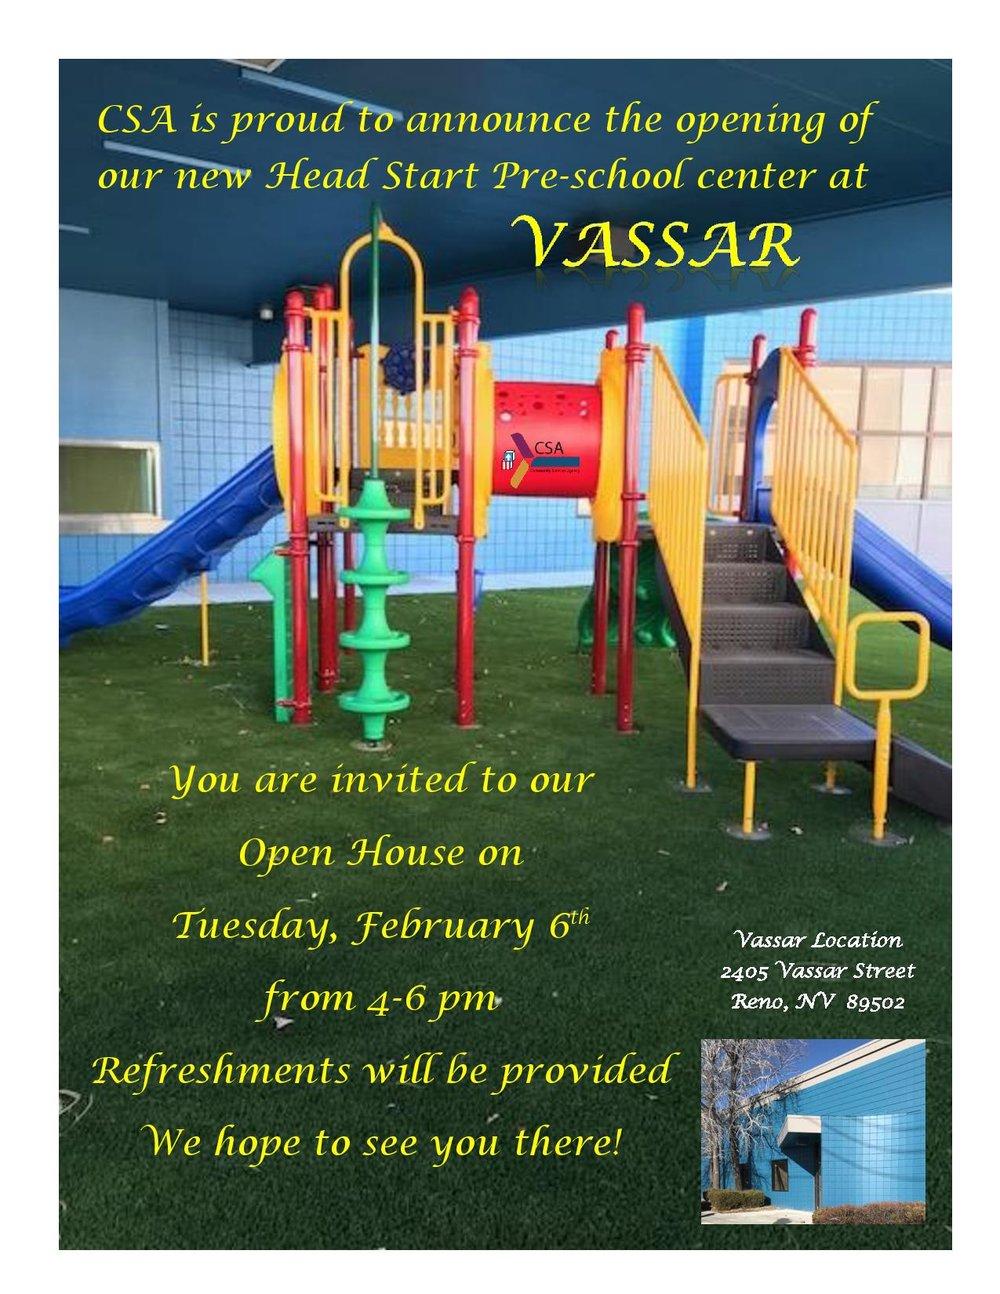 Vassar.Open.House.Flyer-page-001.jpg